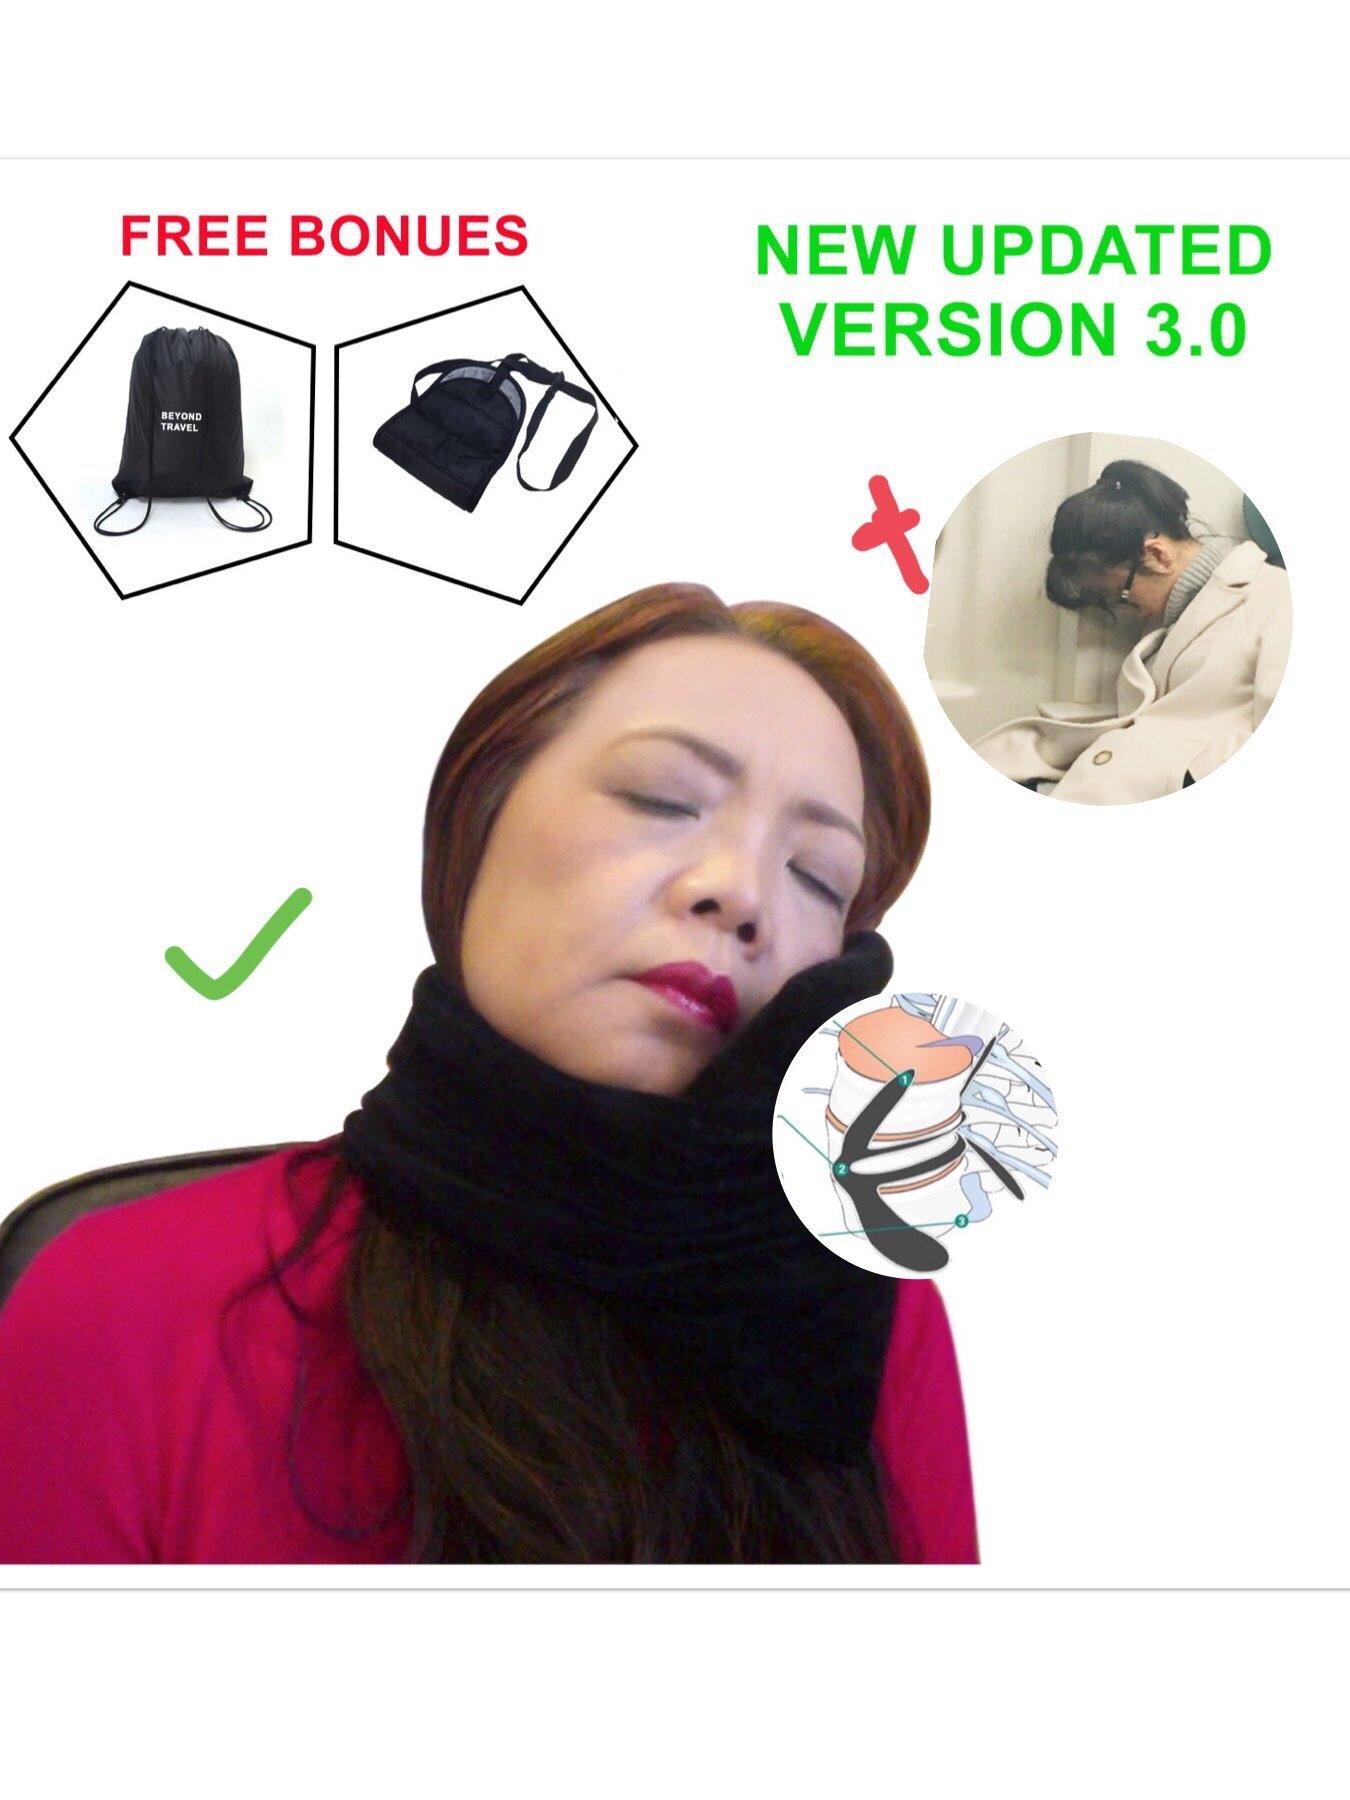 Travel Pillow-Travel Scarf Neck Pillows for Stiff Neck-Head-Support-Pillow for Travel-Mirofiber Velvet-Allergy Free-Best Pillow for Airplane Travel-Foot-Rest&Bag Bonus Set,Travel Accessories Kit